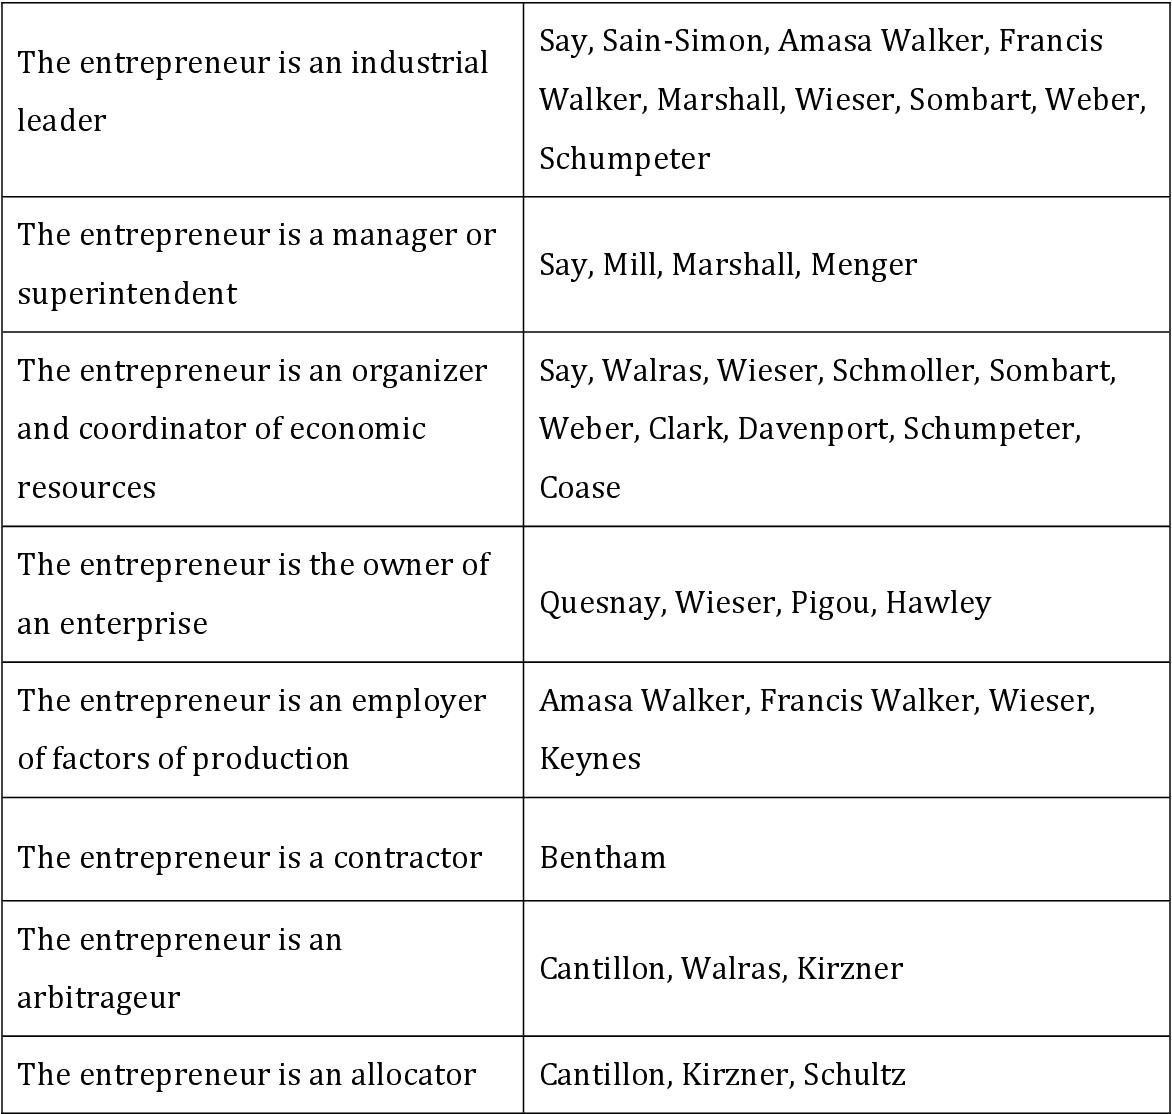 PDF] For-Profit Social Entrepreneurship: A Study of